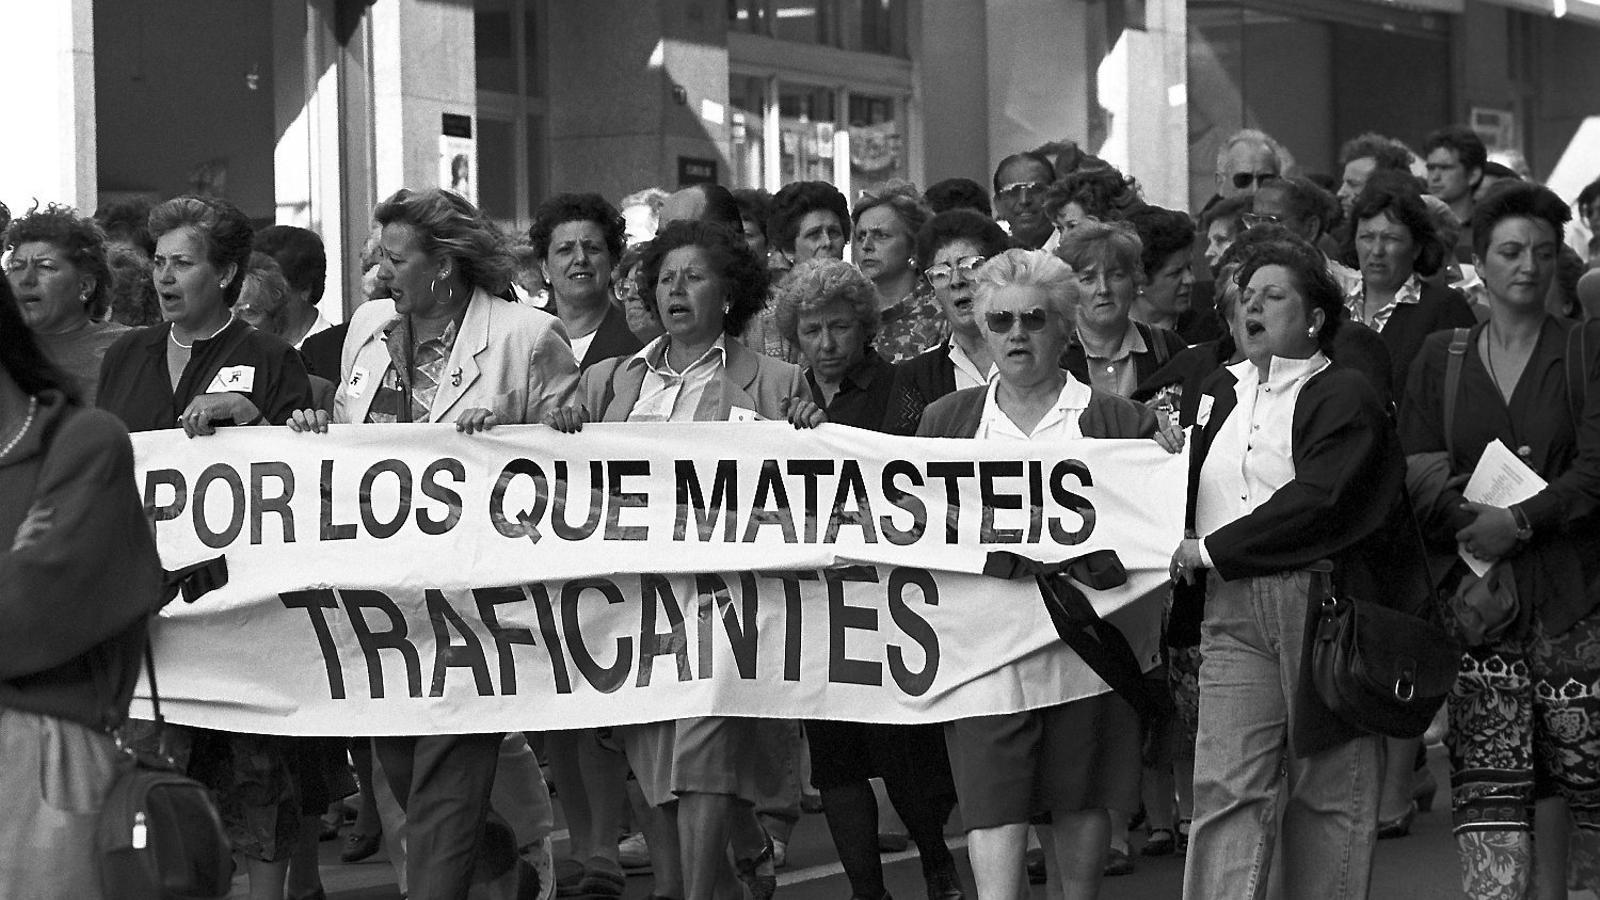 Nacho Carretero: «'Fariña' s'ha convertit en una eina política i contra la censura»